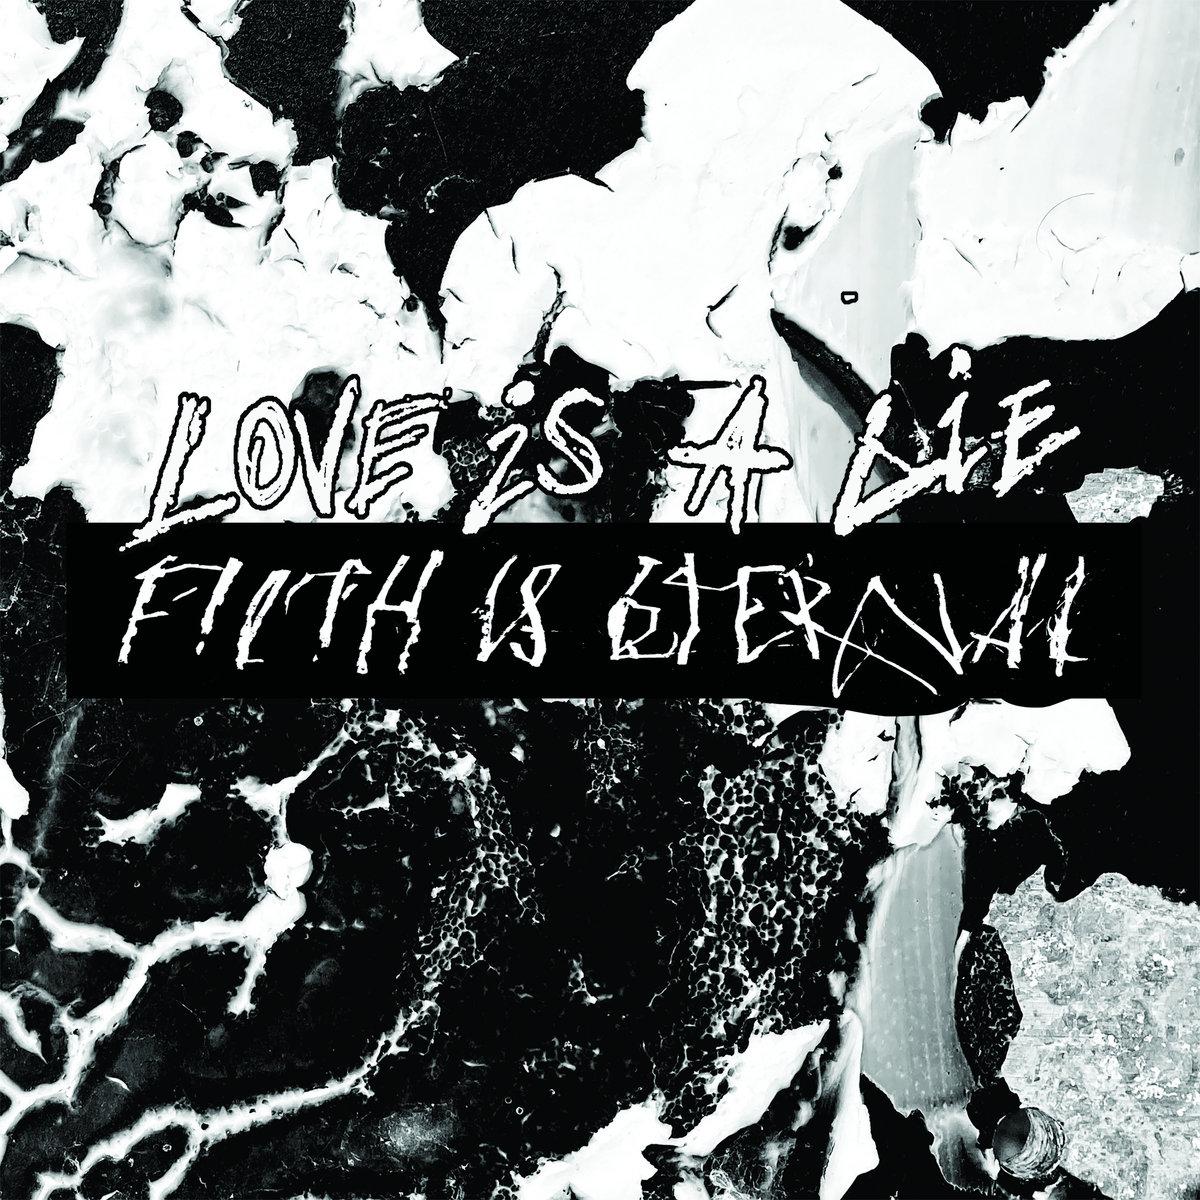 Stream Filth Is Eternal's Merciless New Album Love Is A Lie, Filth Is Eternal